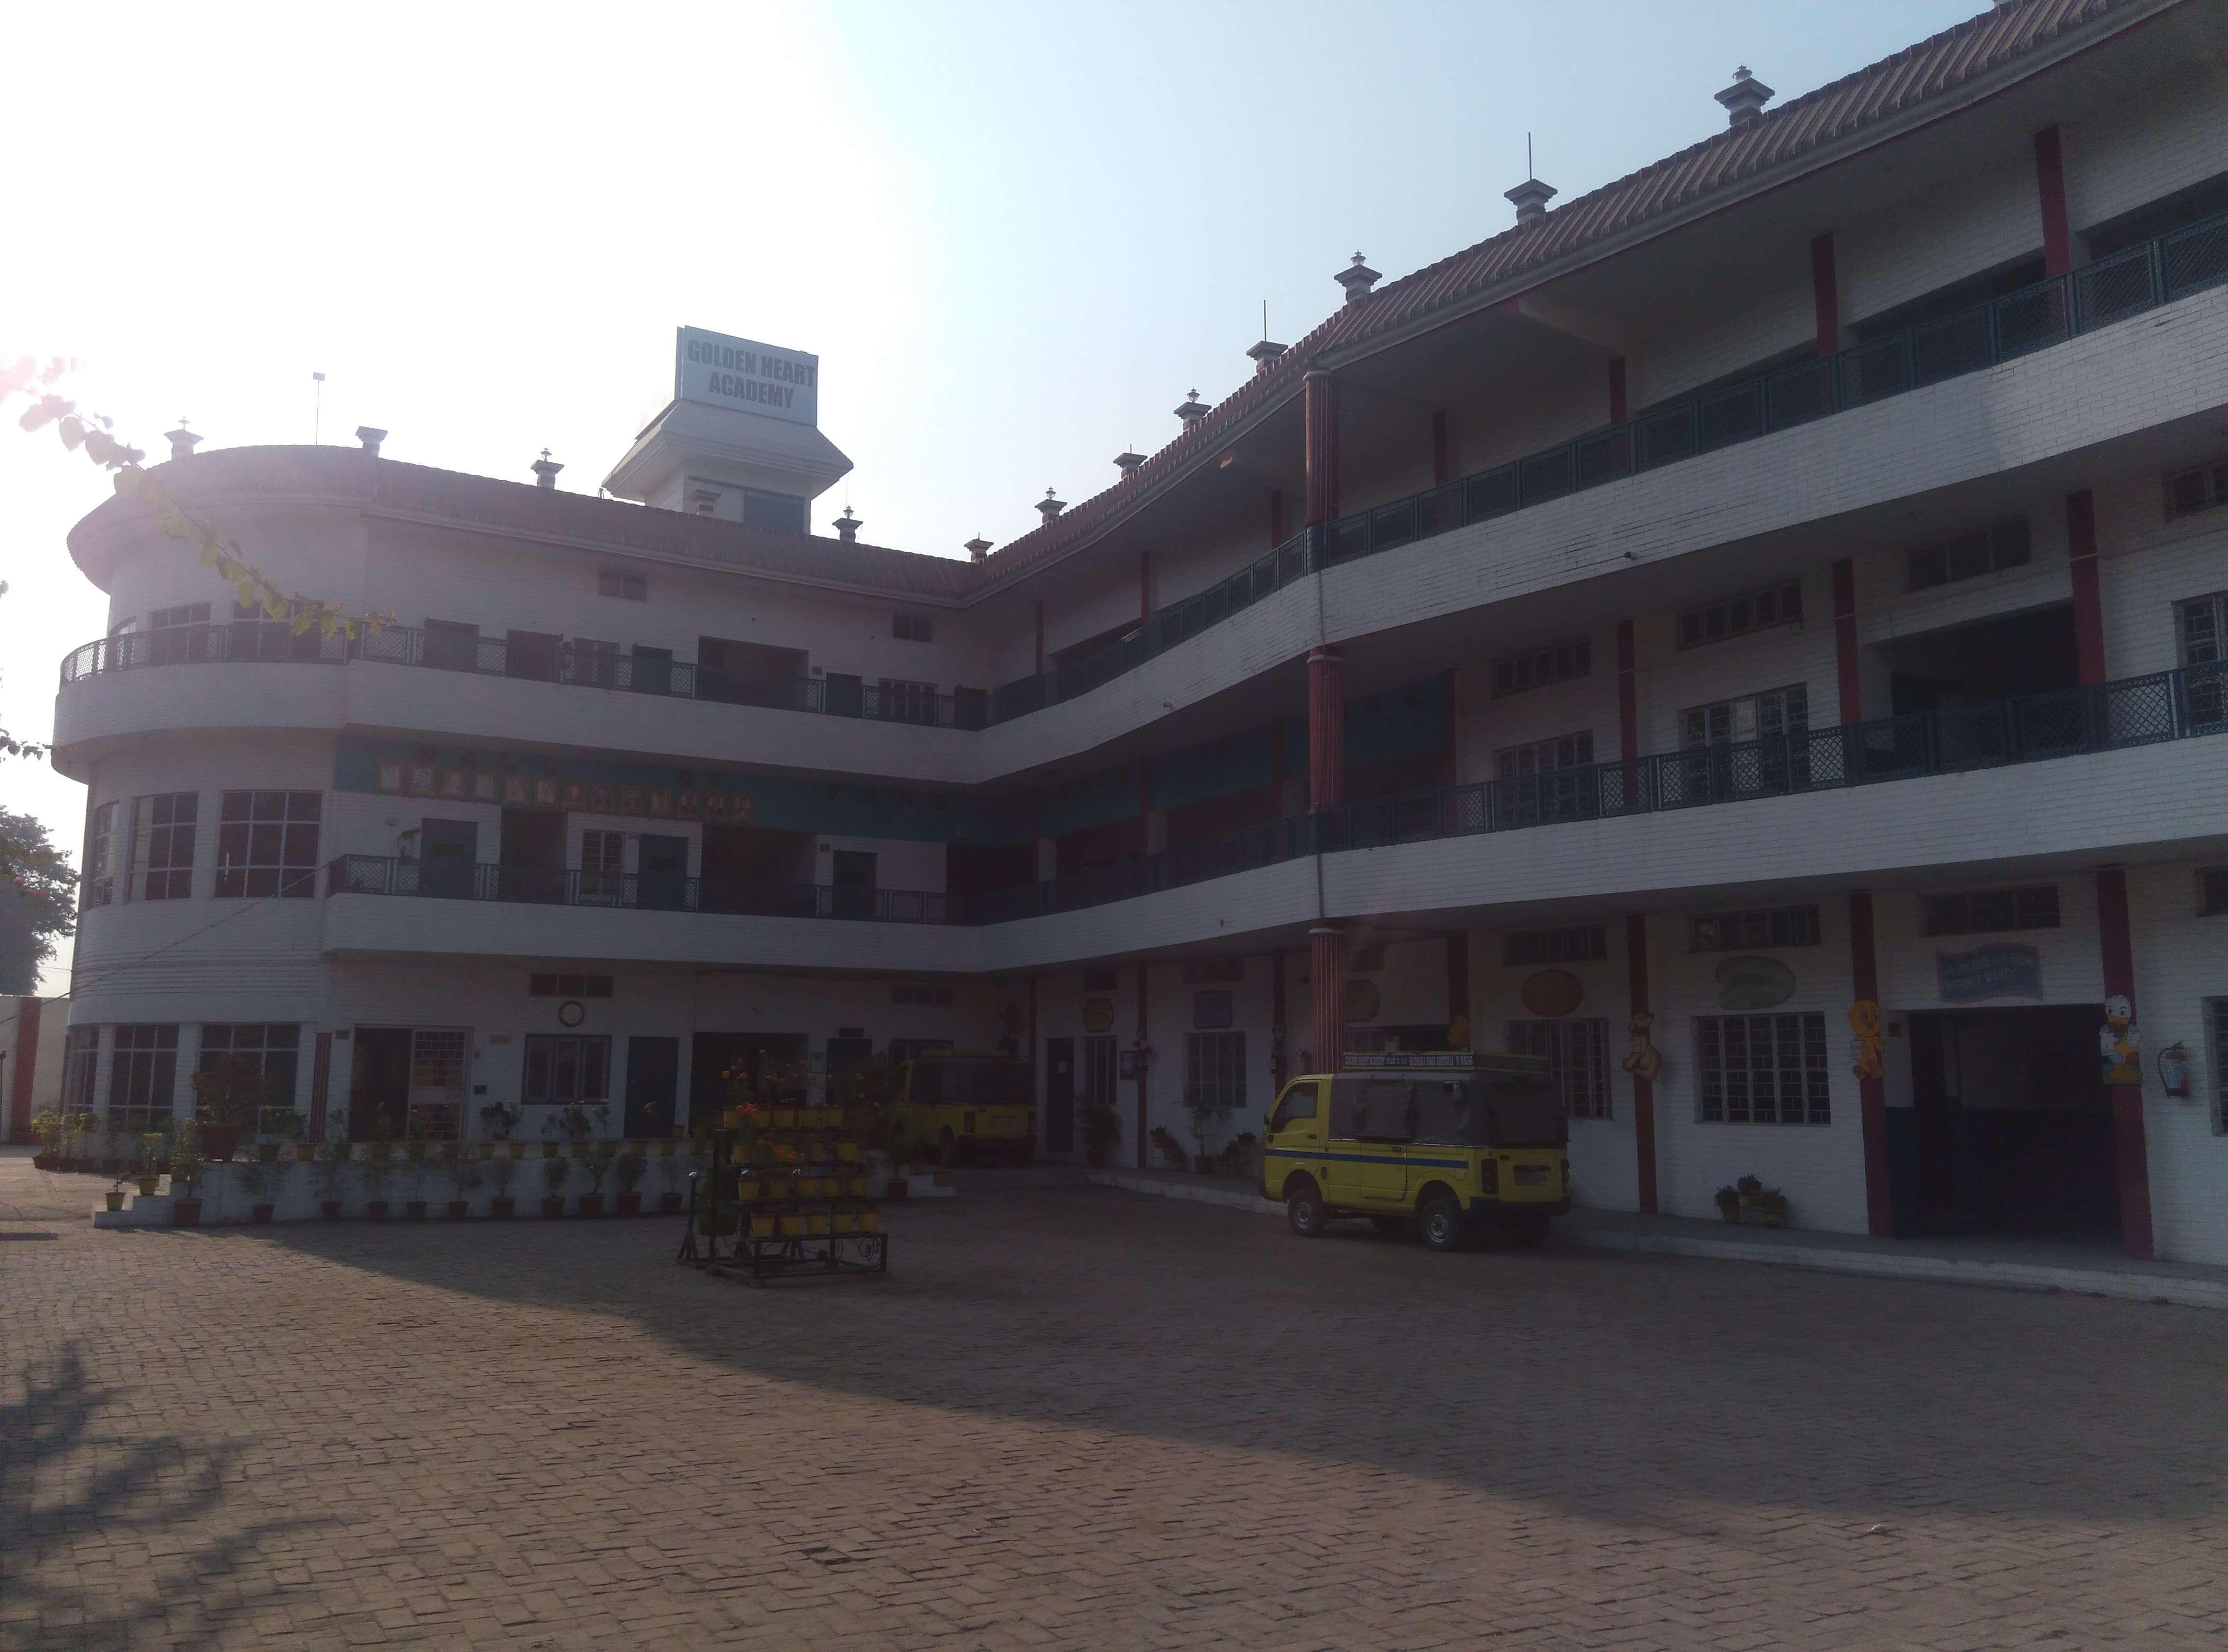 GOLDEN HEART ACADEMY BUDHANA ROAD KHATAULI MUZAFFAR NAGAR UP 2130803